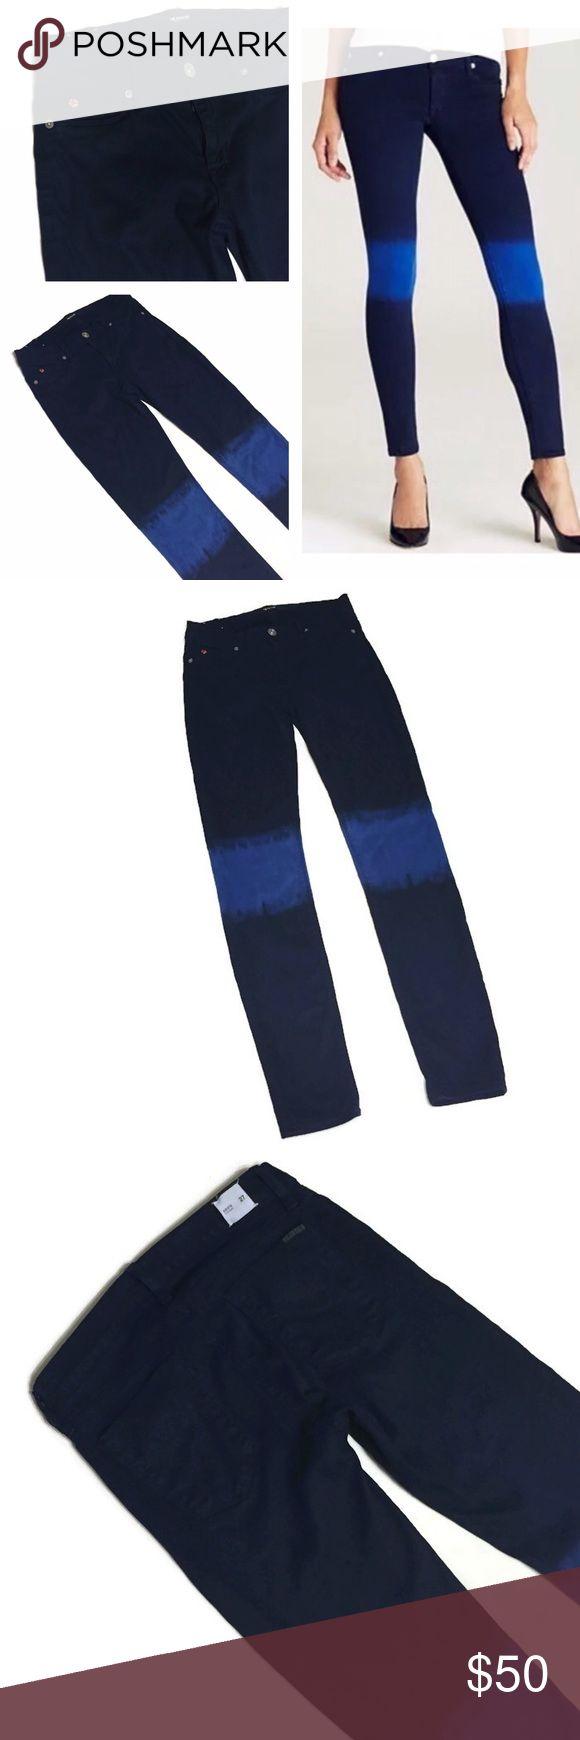 Hudson Jeans Krista Super Skinny jeans Hudson Jeans Krista Super Skinny in navy/tie dye blue. Excellent condition. Bundle and save 💙 Hudson Jeans Jeans Skinny